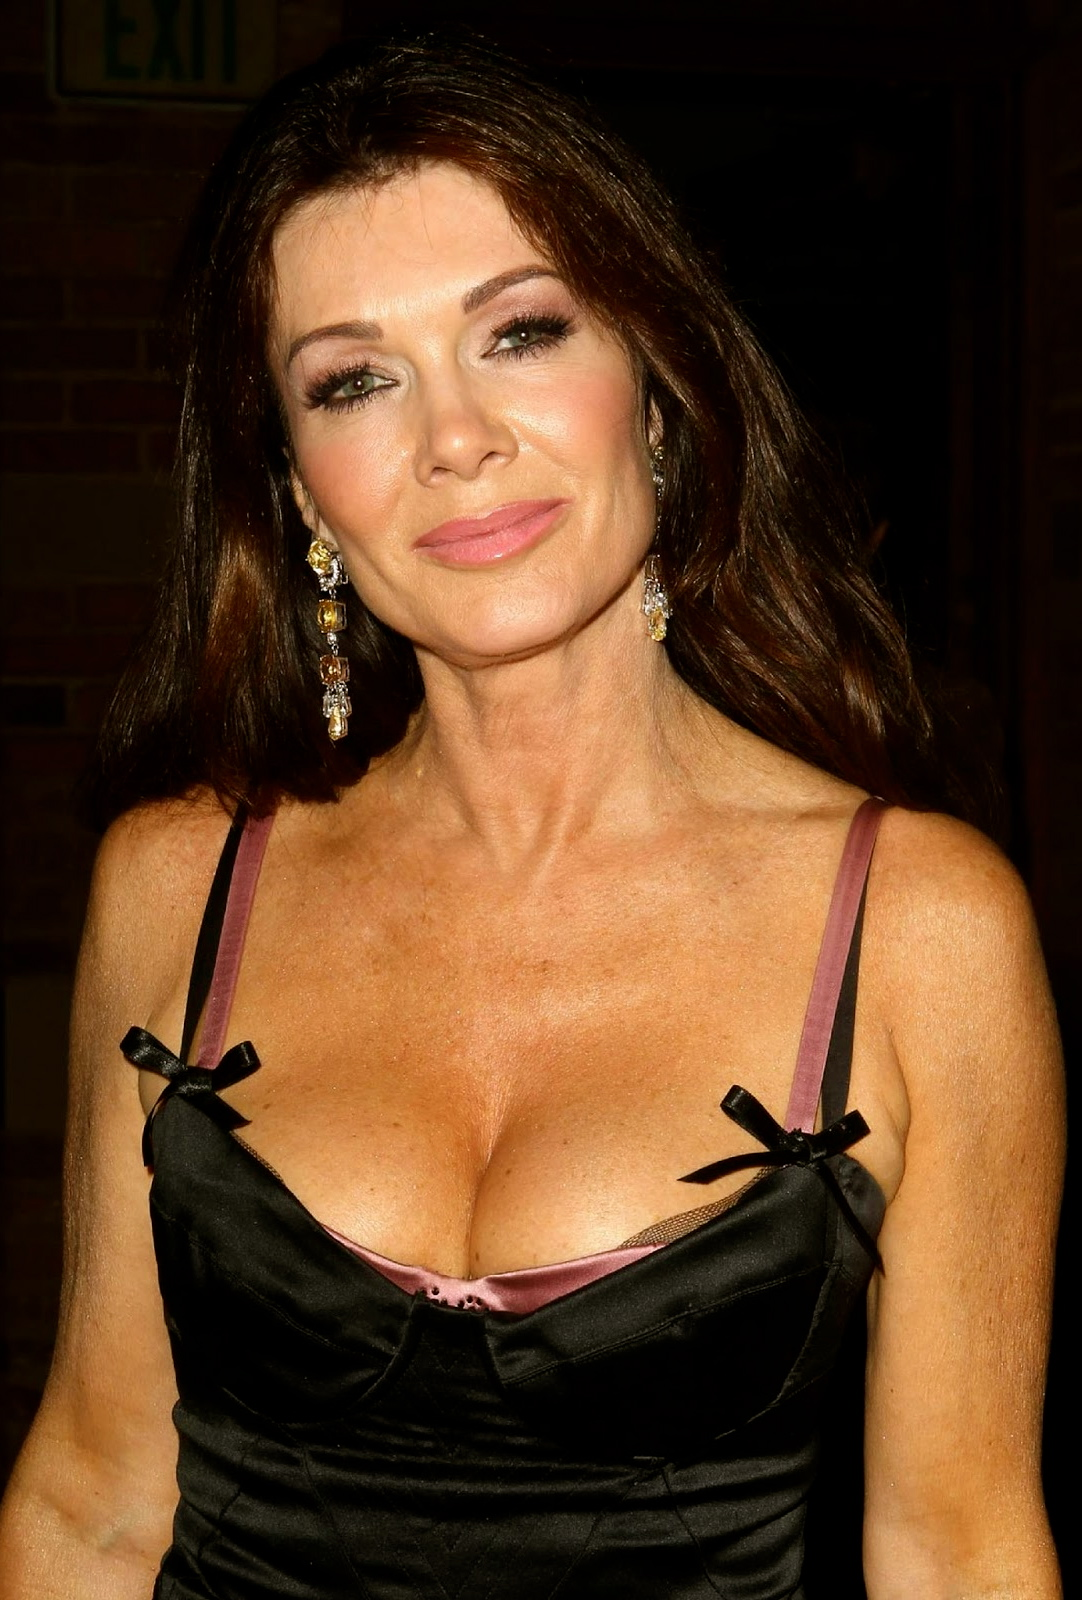 Lisa Vanderpump erotic sexy photo gallery